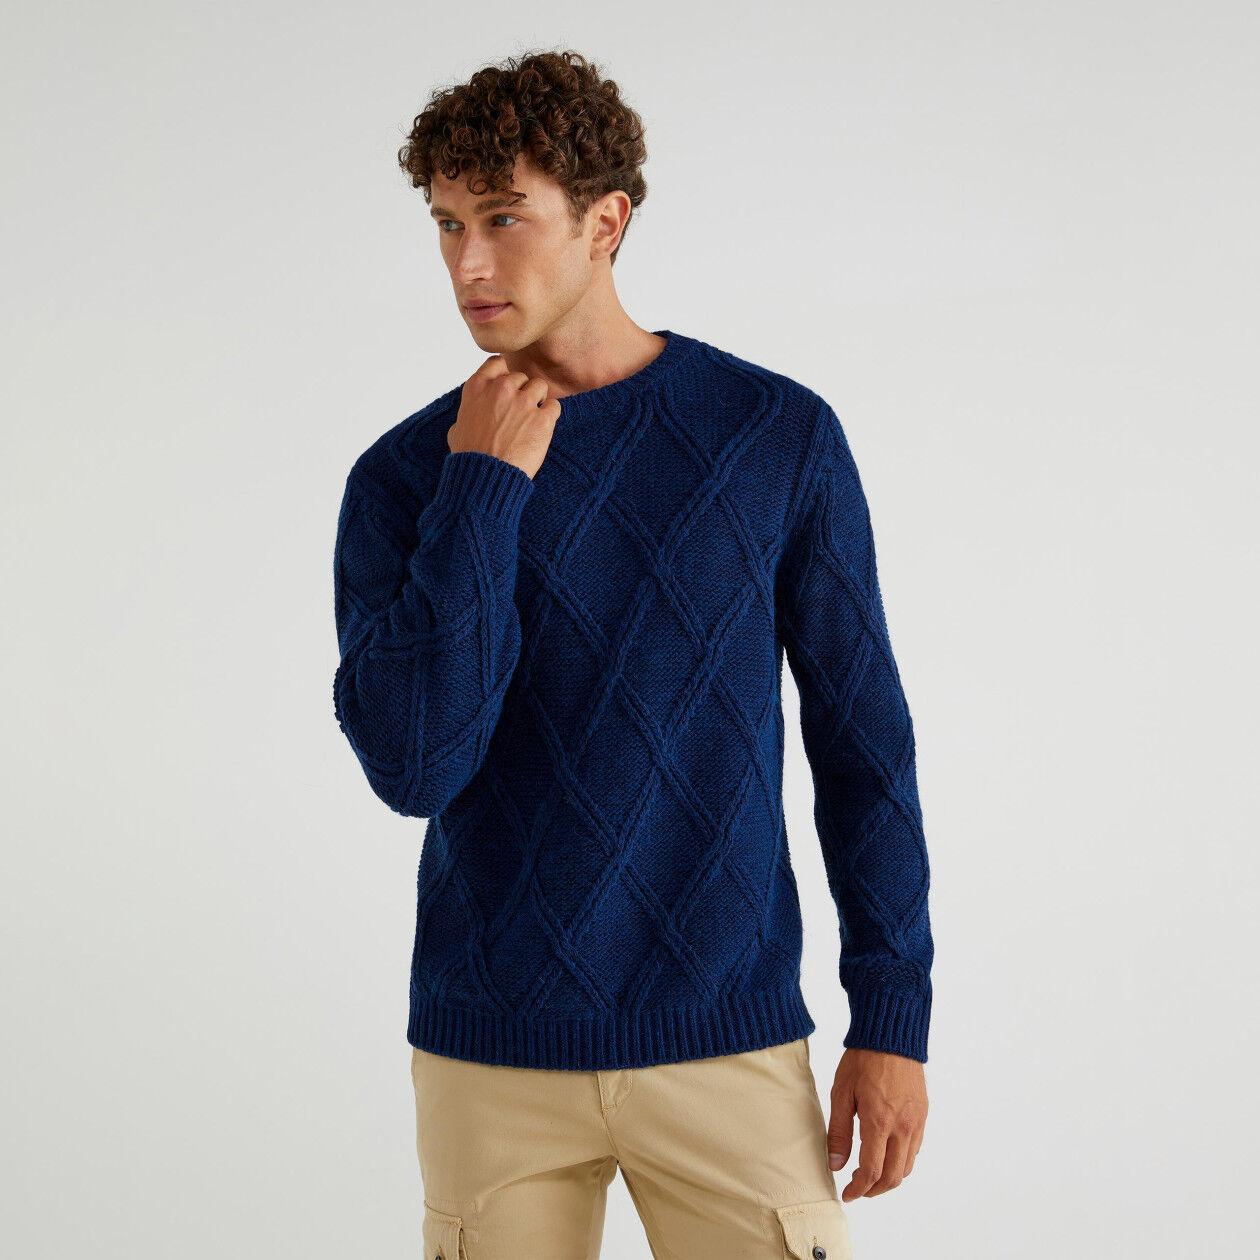 Sweater with diamond pattern